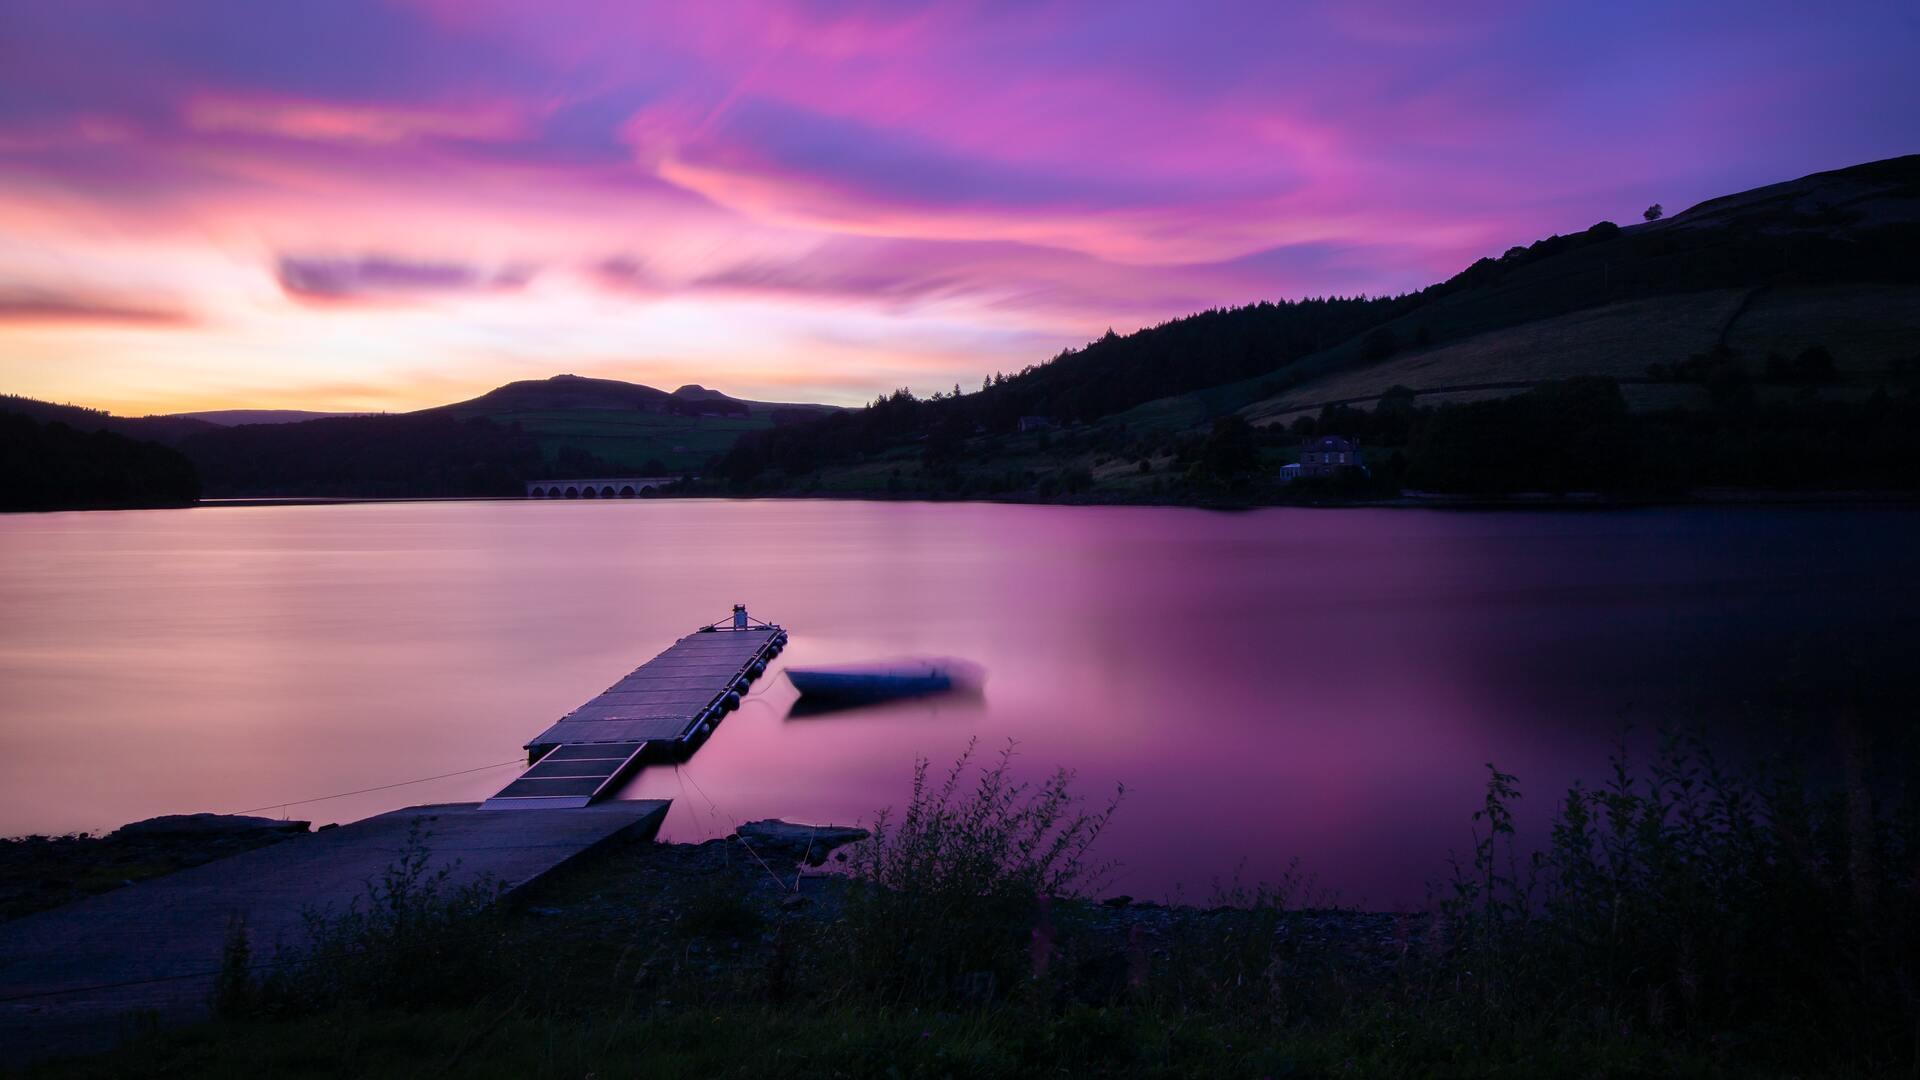 sunset-at-ladybower-reservoir-pier-side-5k-6p.jpg